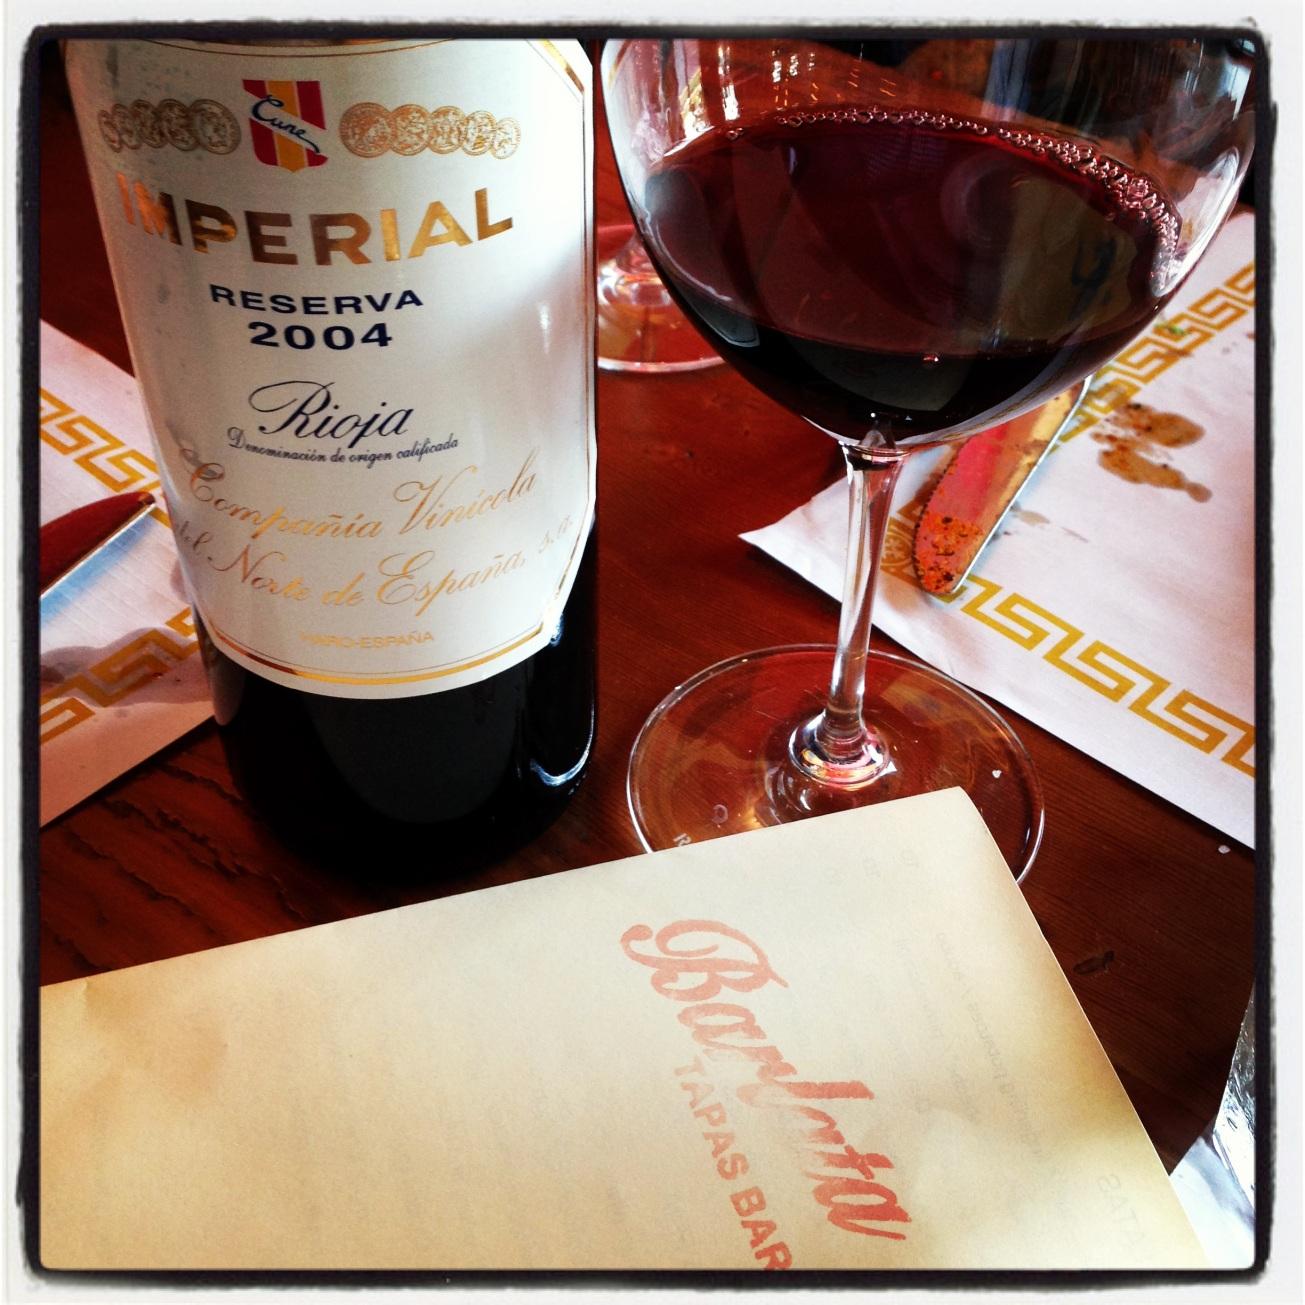 2004 C.V.N.E. (Compañía Vinícola del Norte de España) Rioja Imperial Reserva